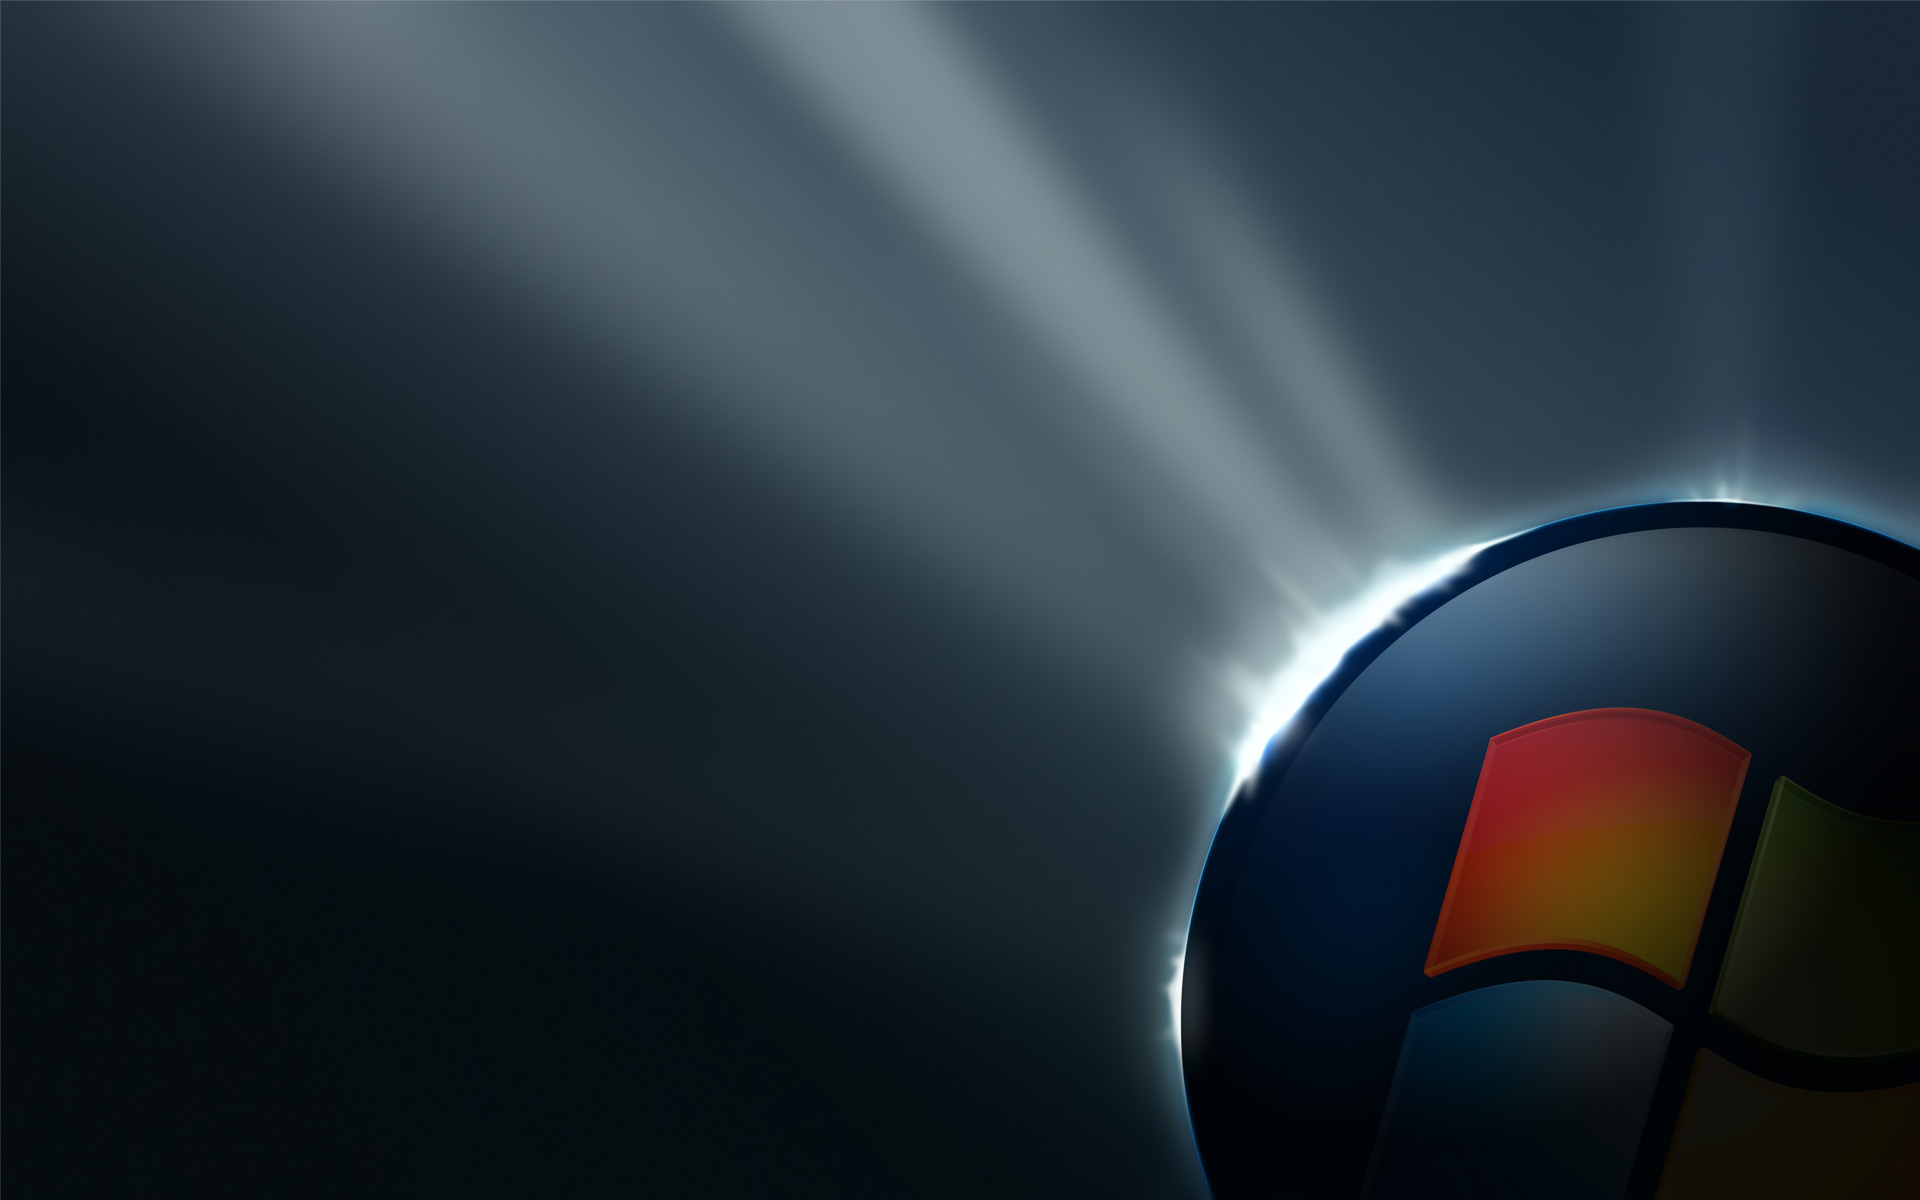 Hd wallpaper themes - Windows Vista Themes Hd Wallpaper High Definition Wallpaper Hd